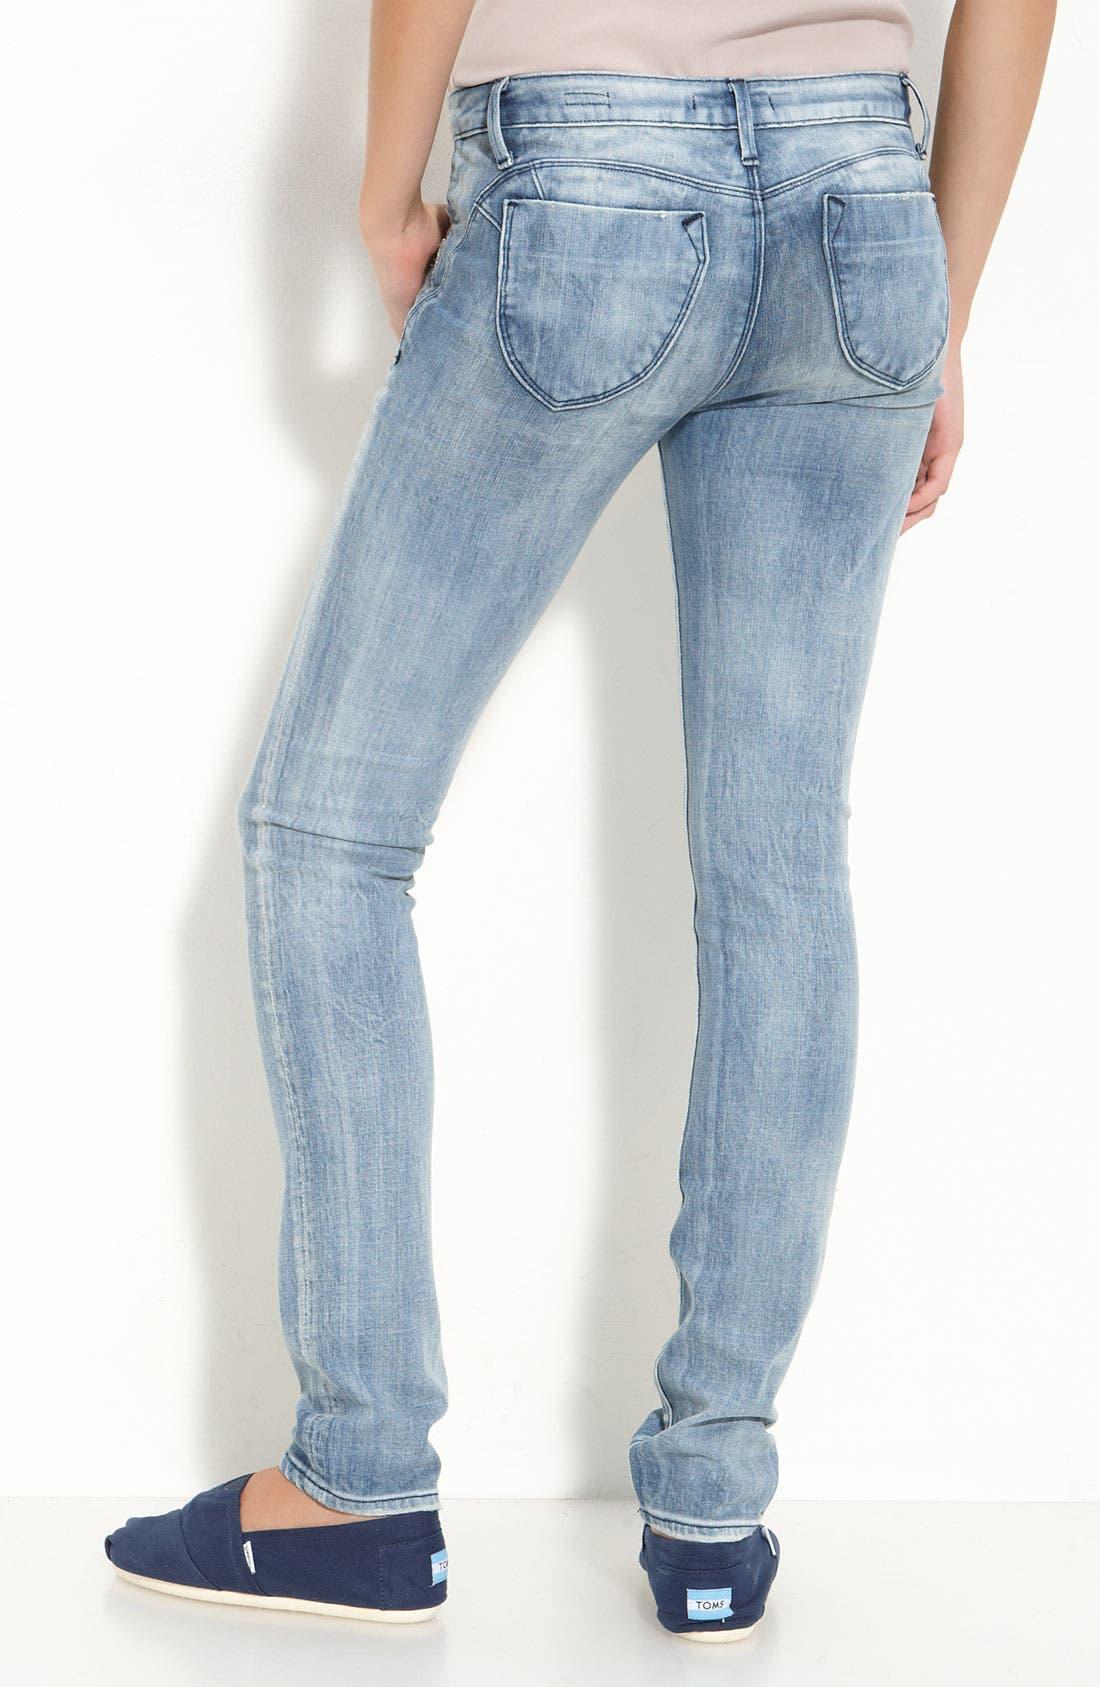 Main Image - Vigoss '88' Stretch Denim Skinny Jeans (Light Wash) (Juniors)